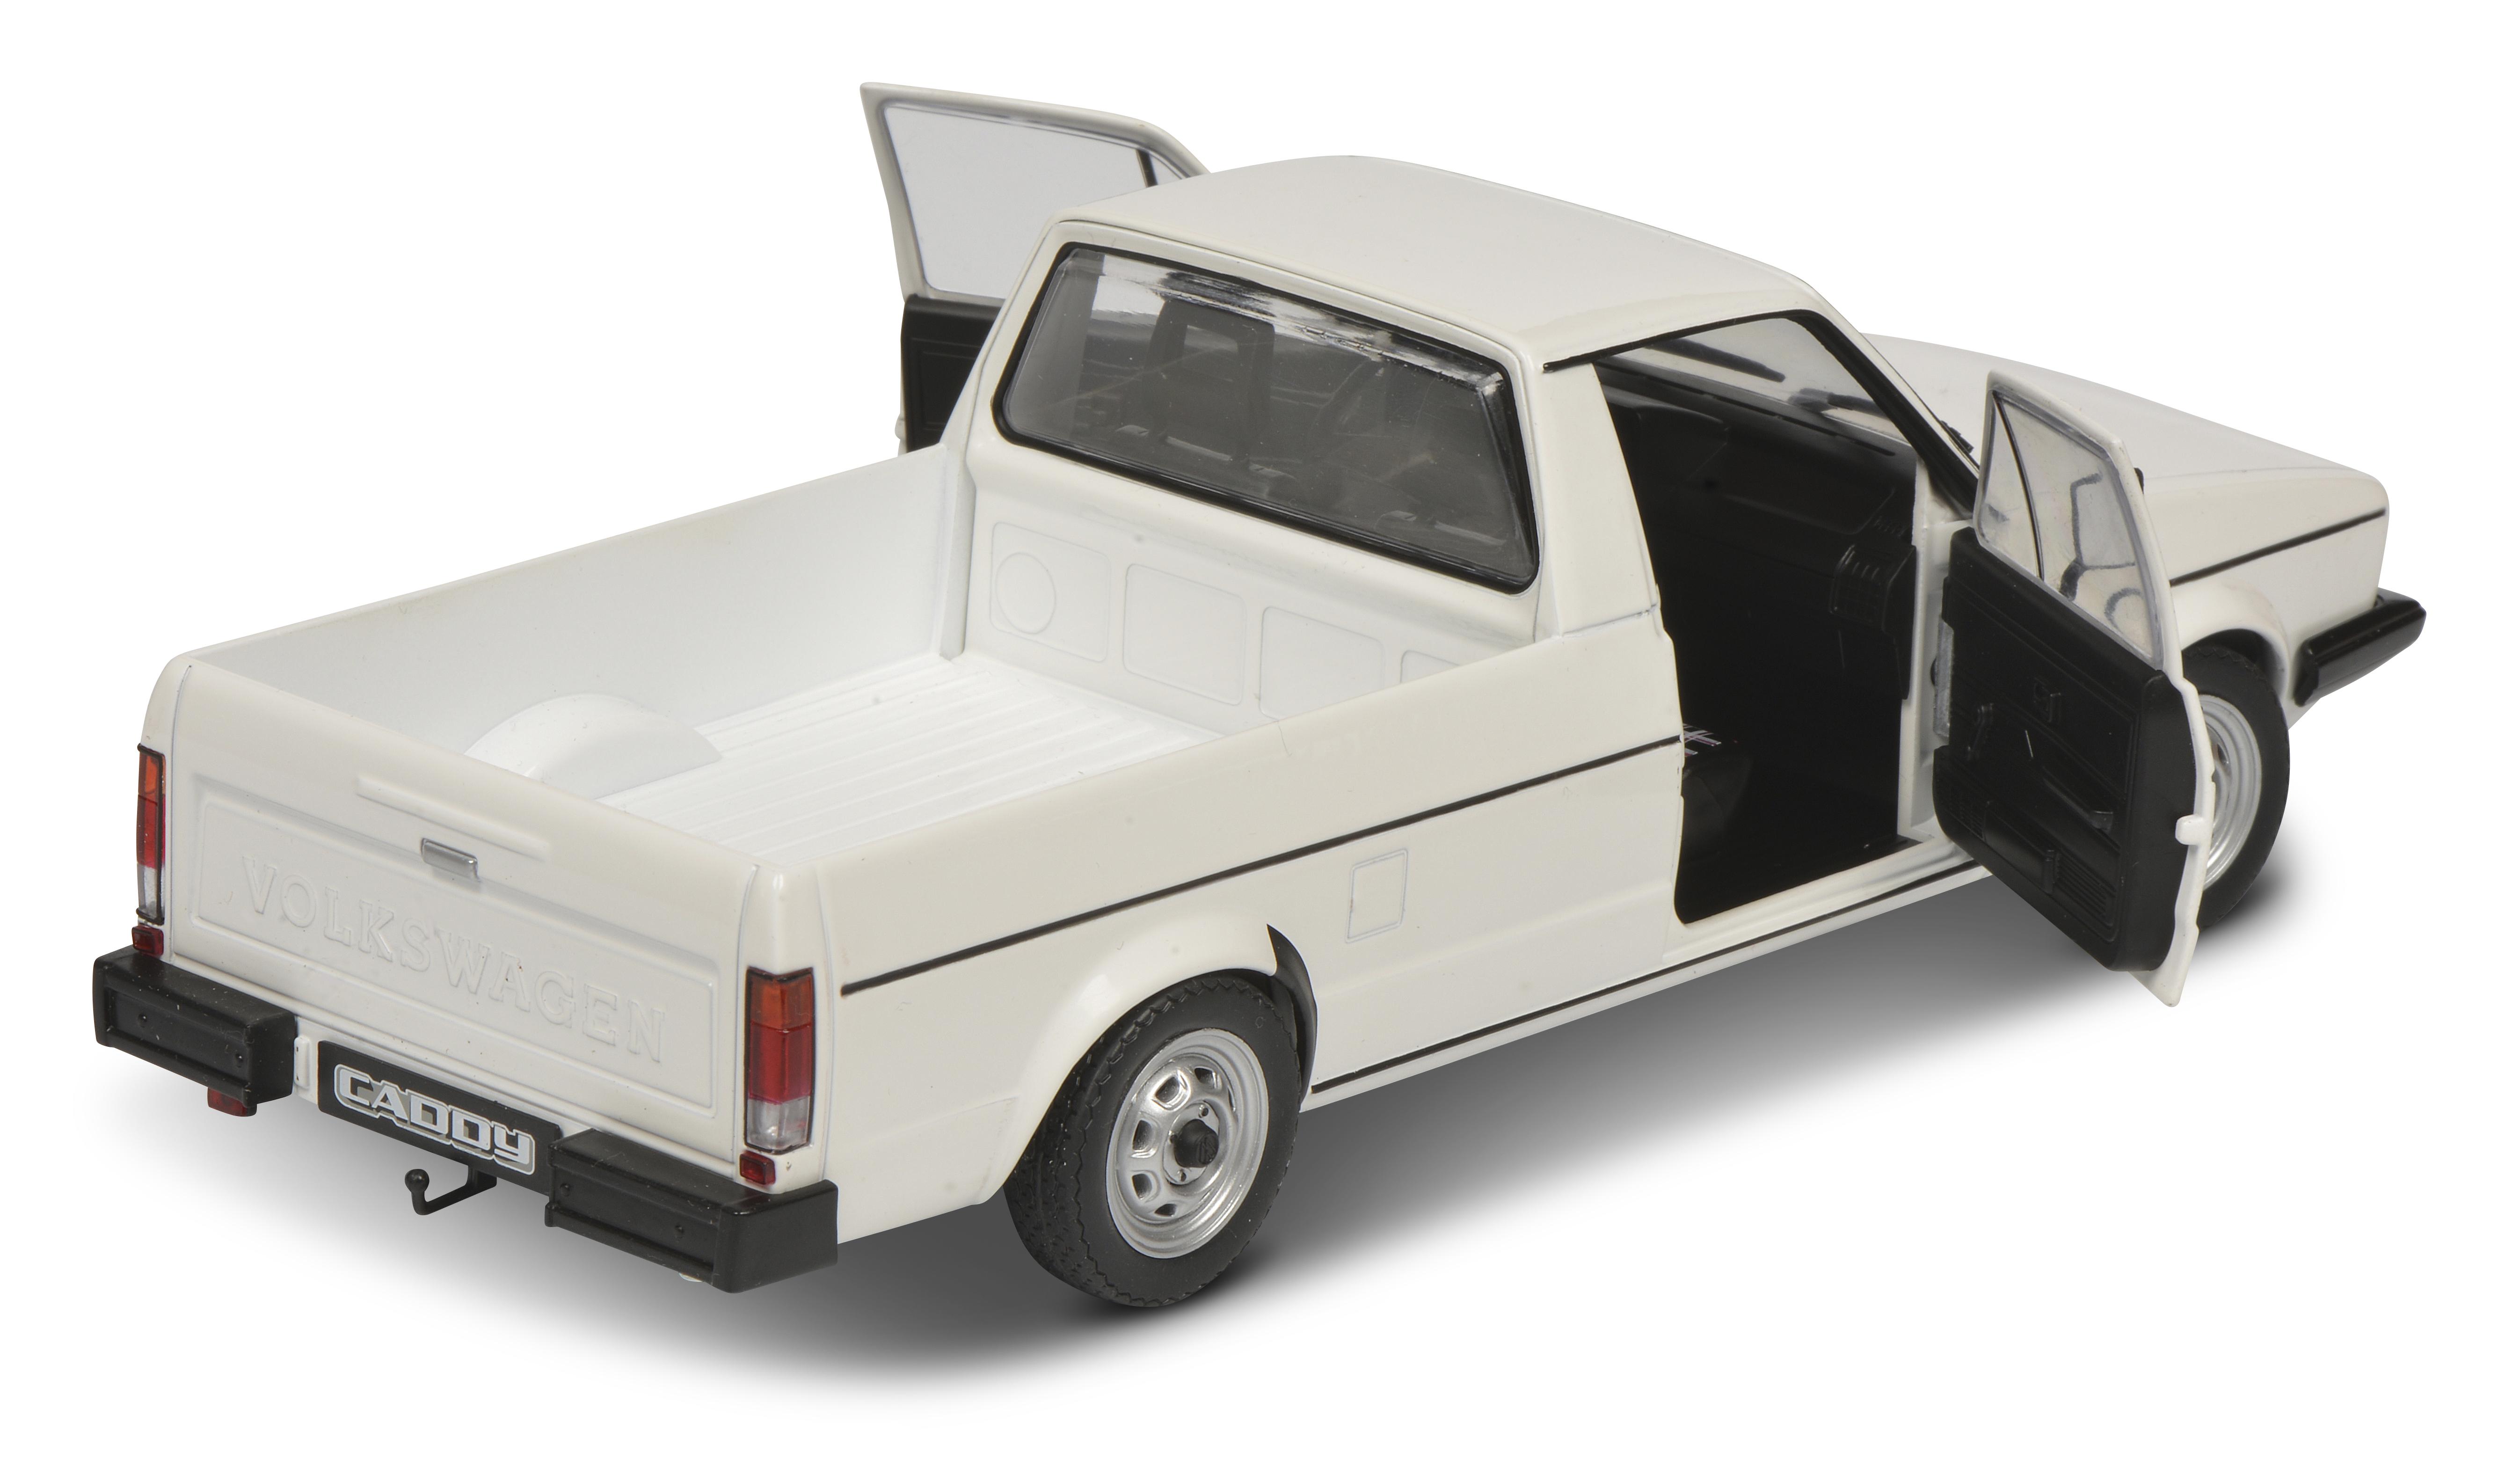 Solido VW Caddy 1982 MKI 1:18 weiss 421185320 Modellauto S1803501